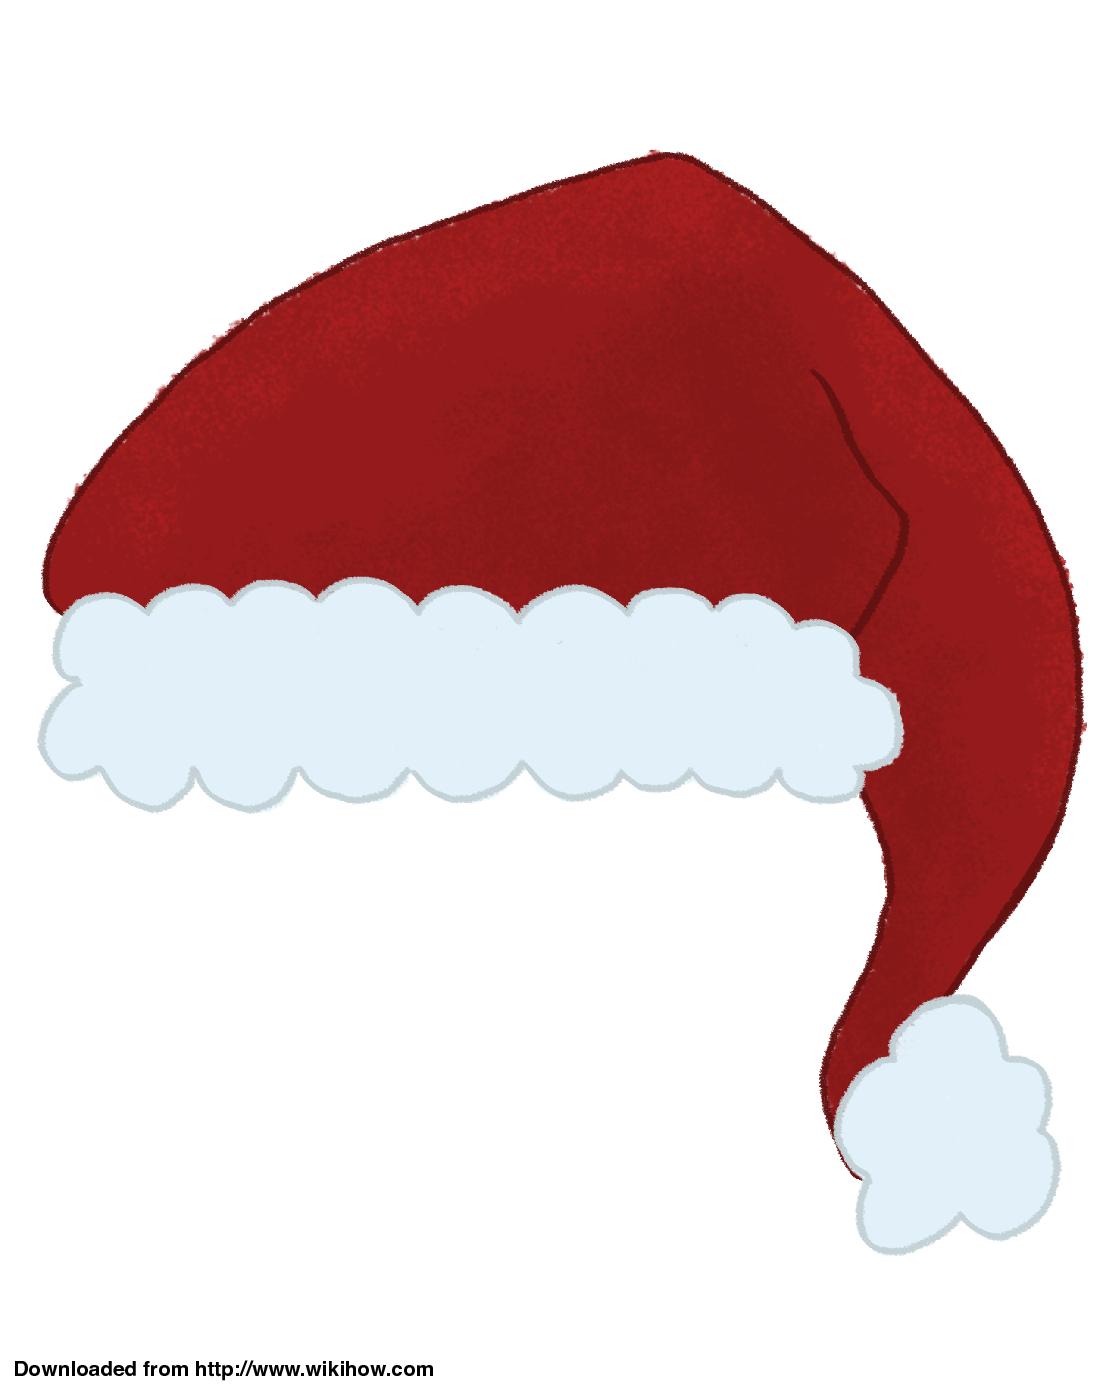 Drawn santa hat printable Hat Printable Hat Make Ways